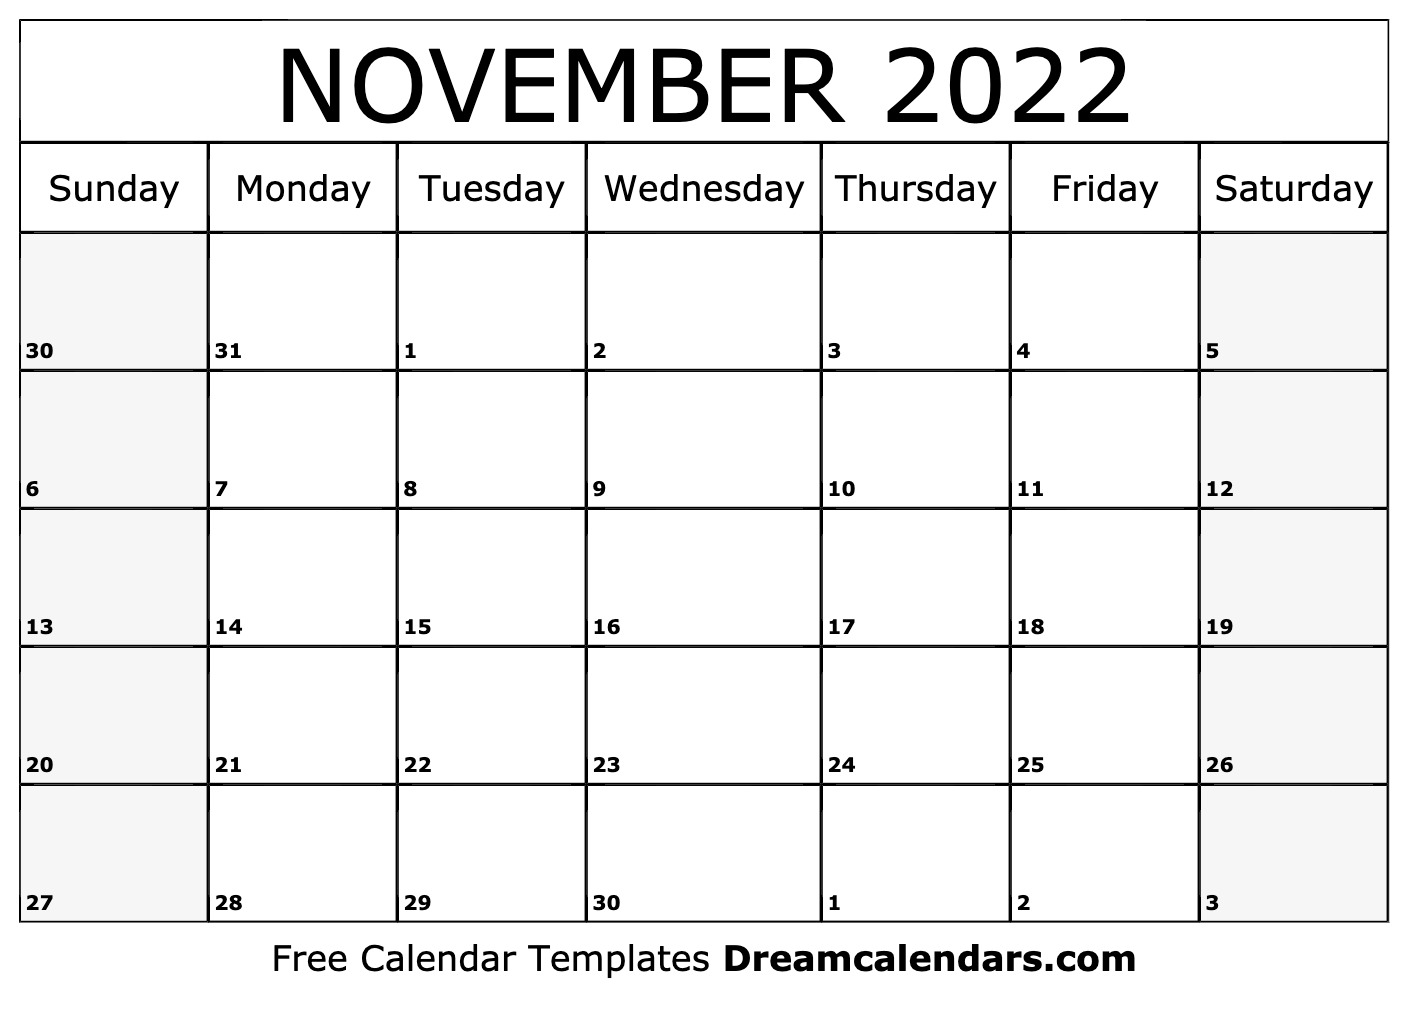 Nov 2022 Calendar With Holidays.November 2022 Calendar Free Blank Printable Templates